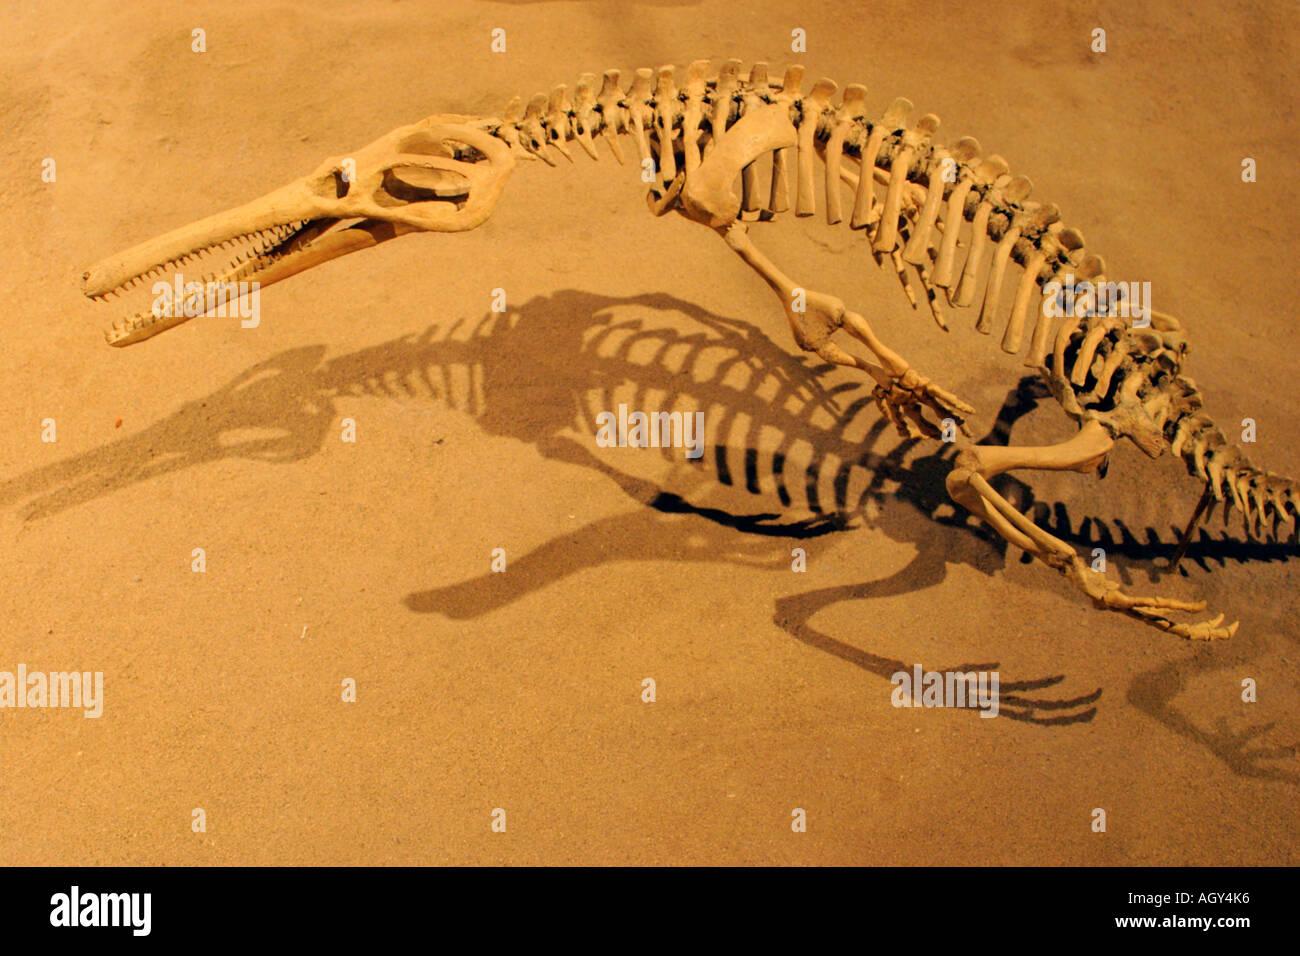 Portrait of lifesize replica of Champosaurus dinosaur Royal Tyrrell Museum Drumheller Alberta Canada - Stock Image